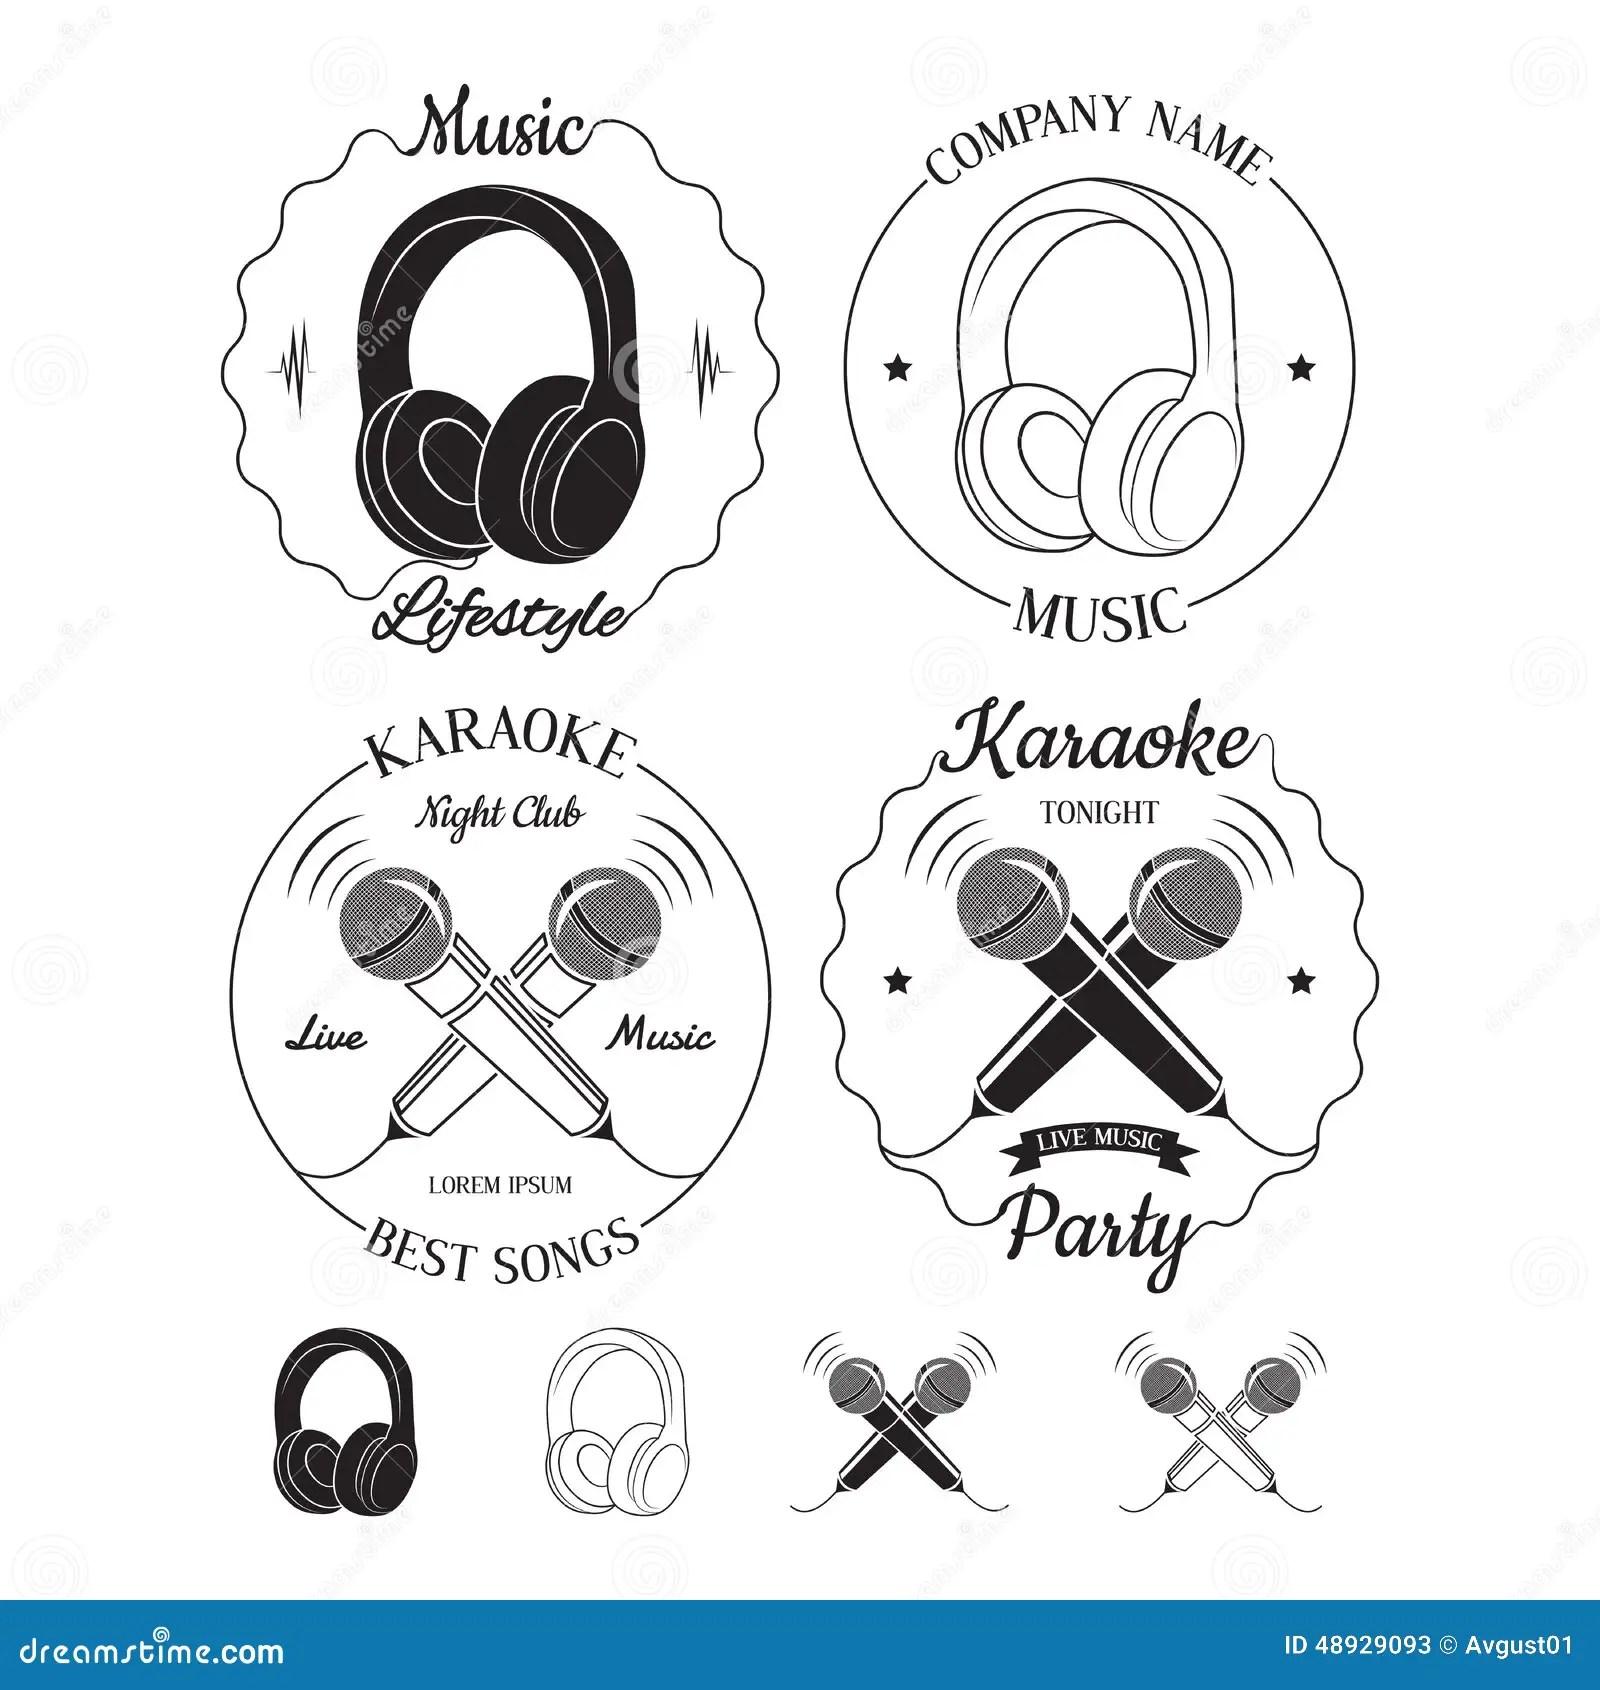 Set Of Music And Karaoke Logos, Labels, Badges And Design